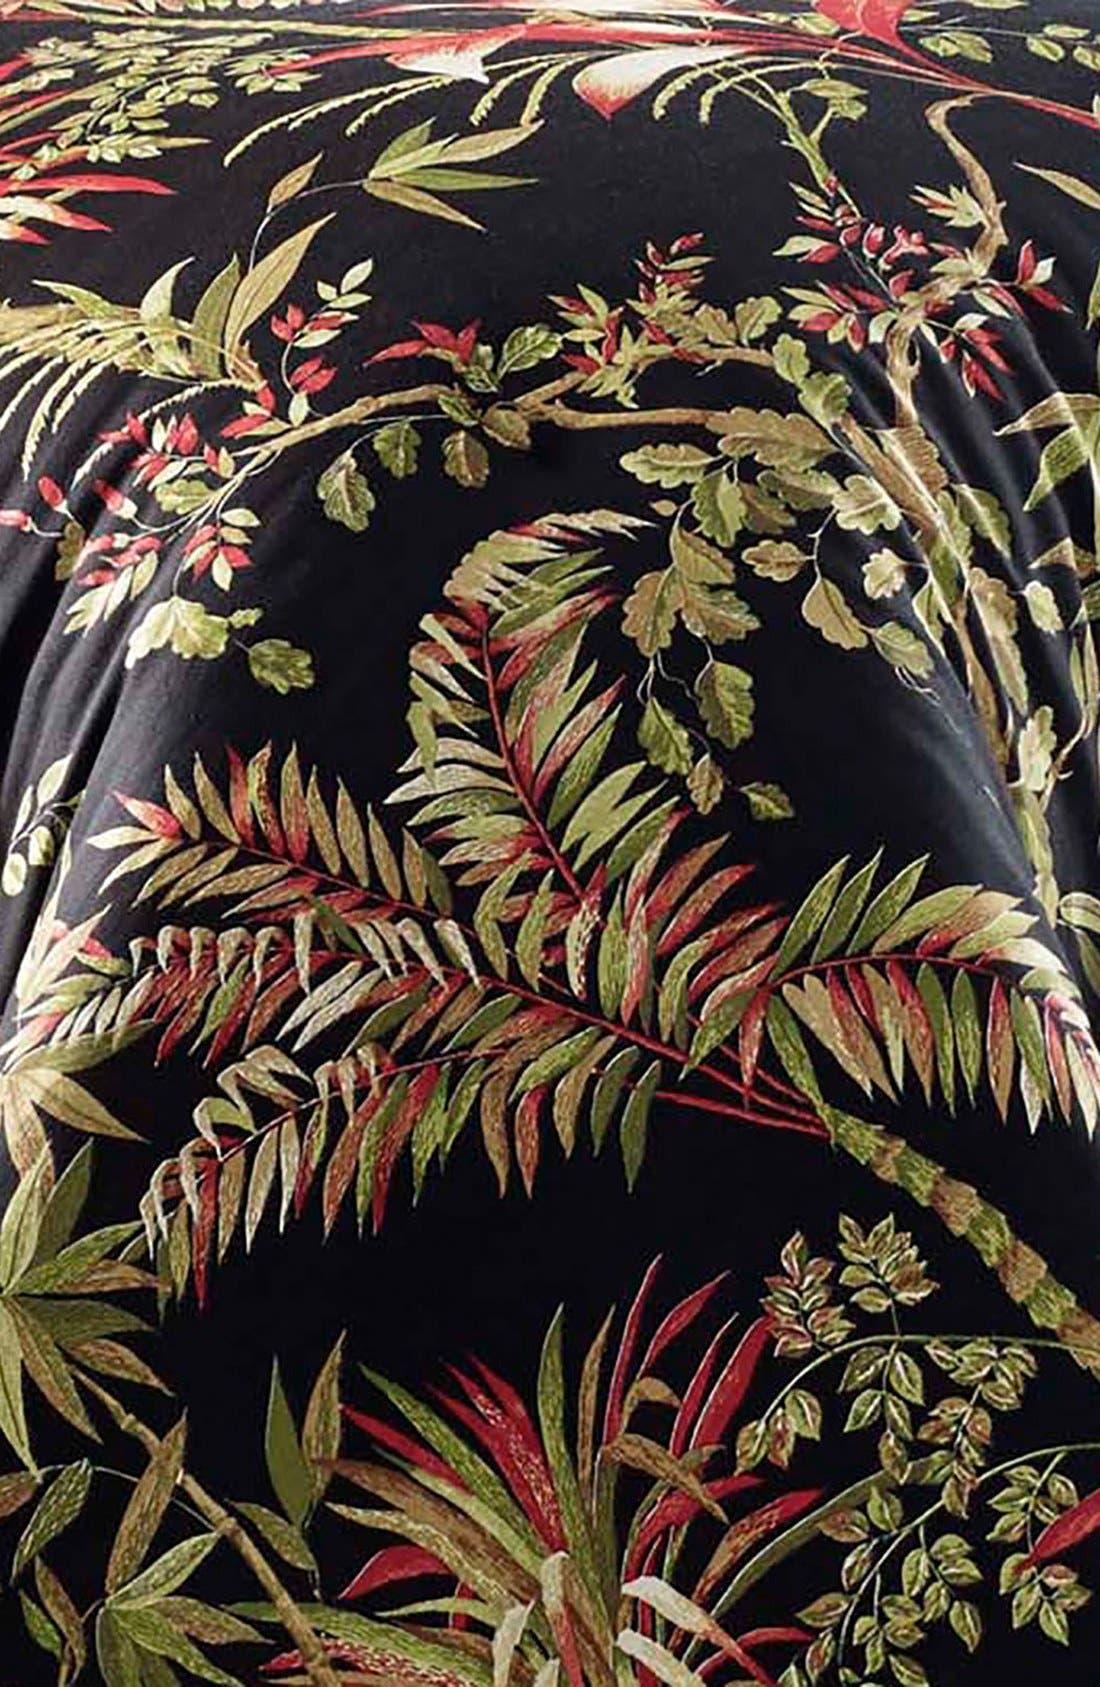 Jungle Drive Comforter, Sham & Bed Skirt Set,                             Alternate thumbnail 2, color,                             001